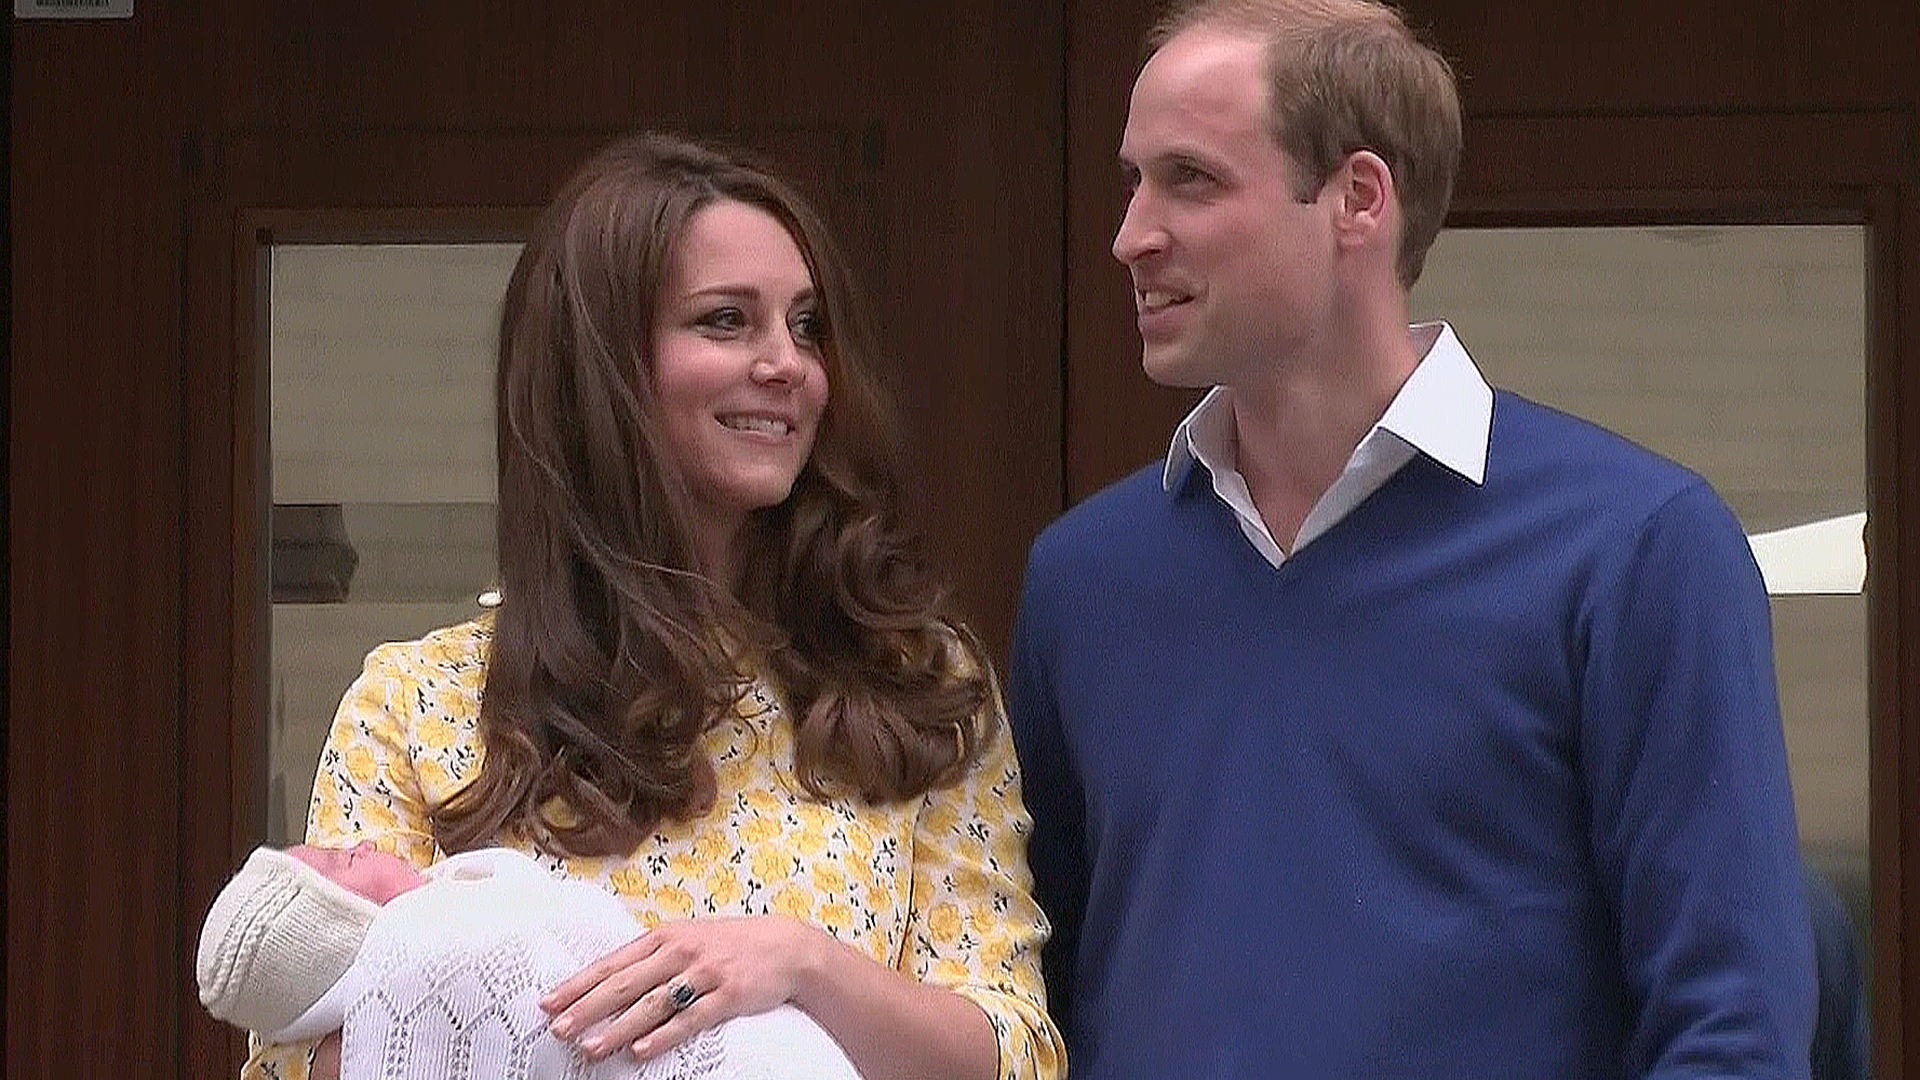 Britain's Royal Baby Named as Princess Charlotte Elizabeth Diana.